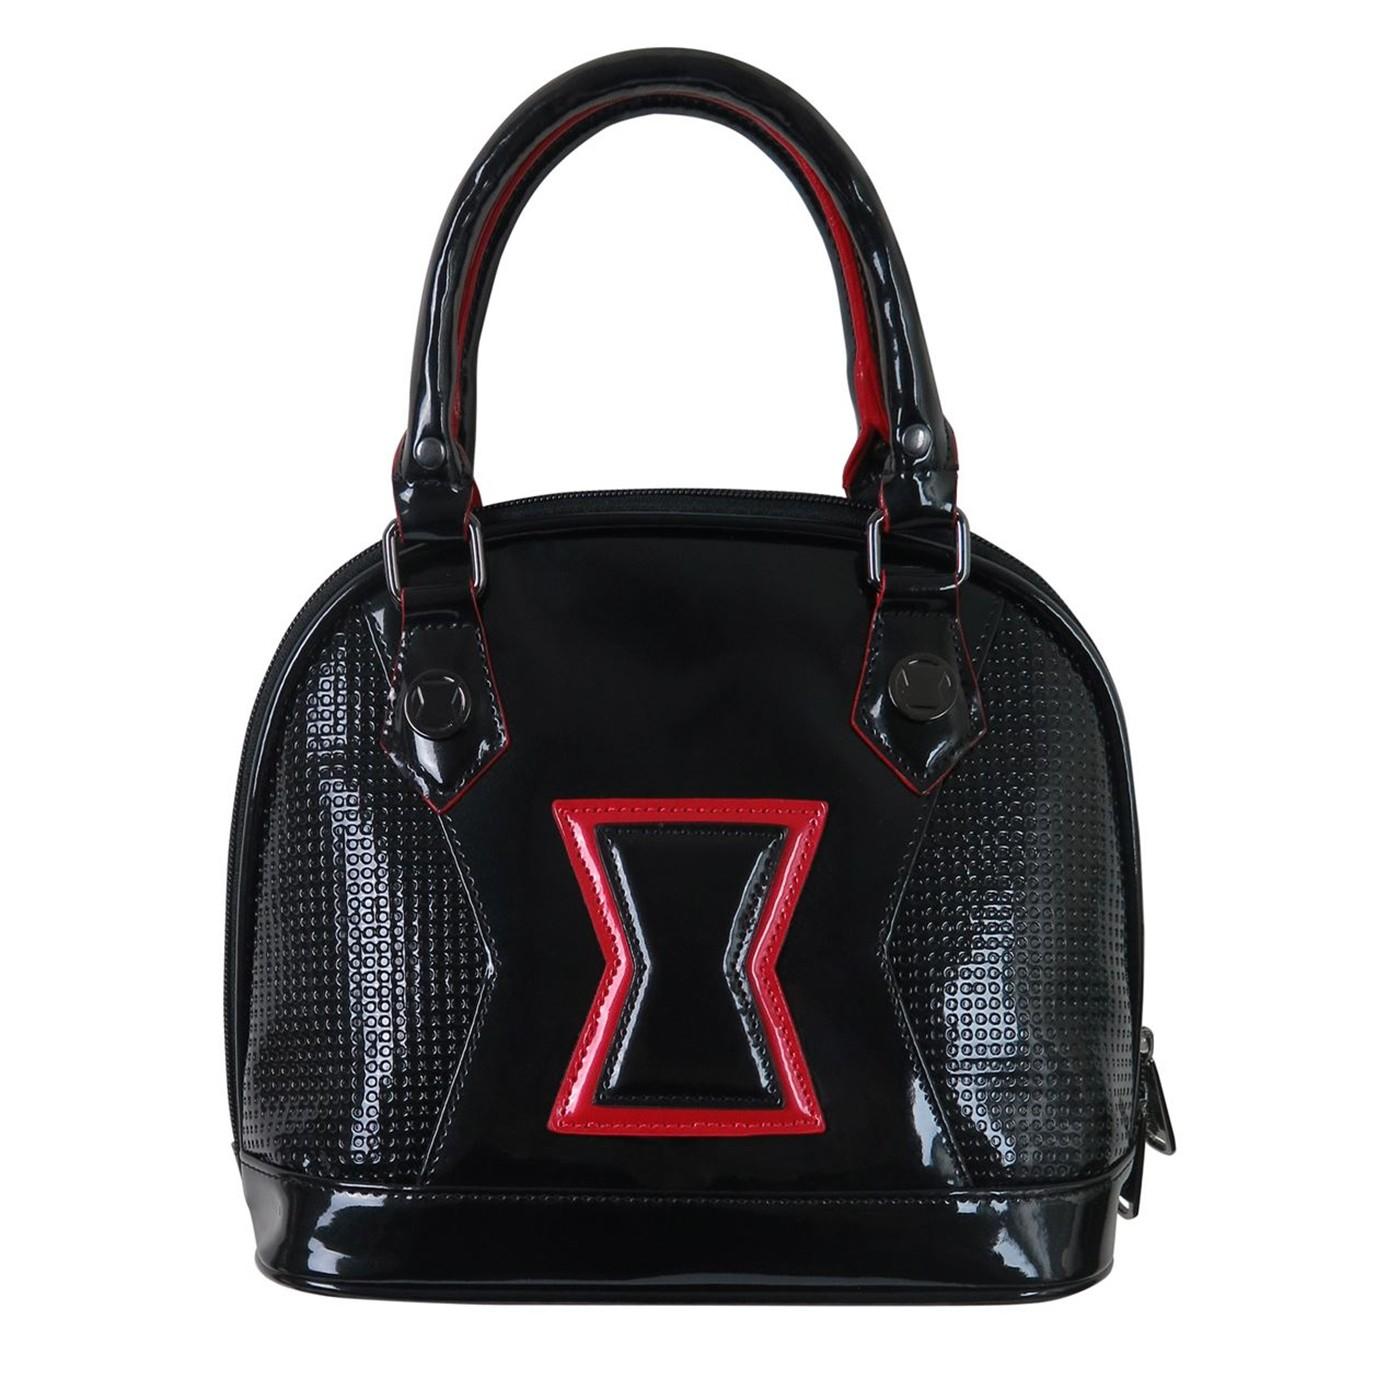 Black Widow Symbol Loungefly Patent Leather Handbag